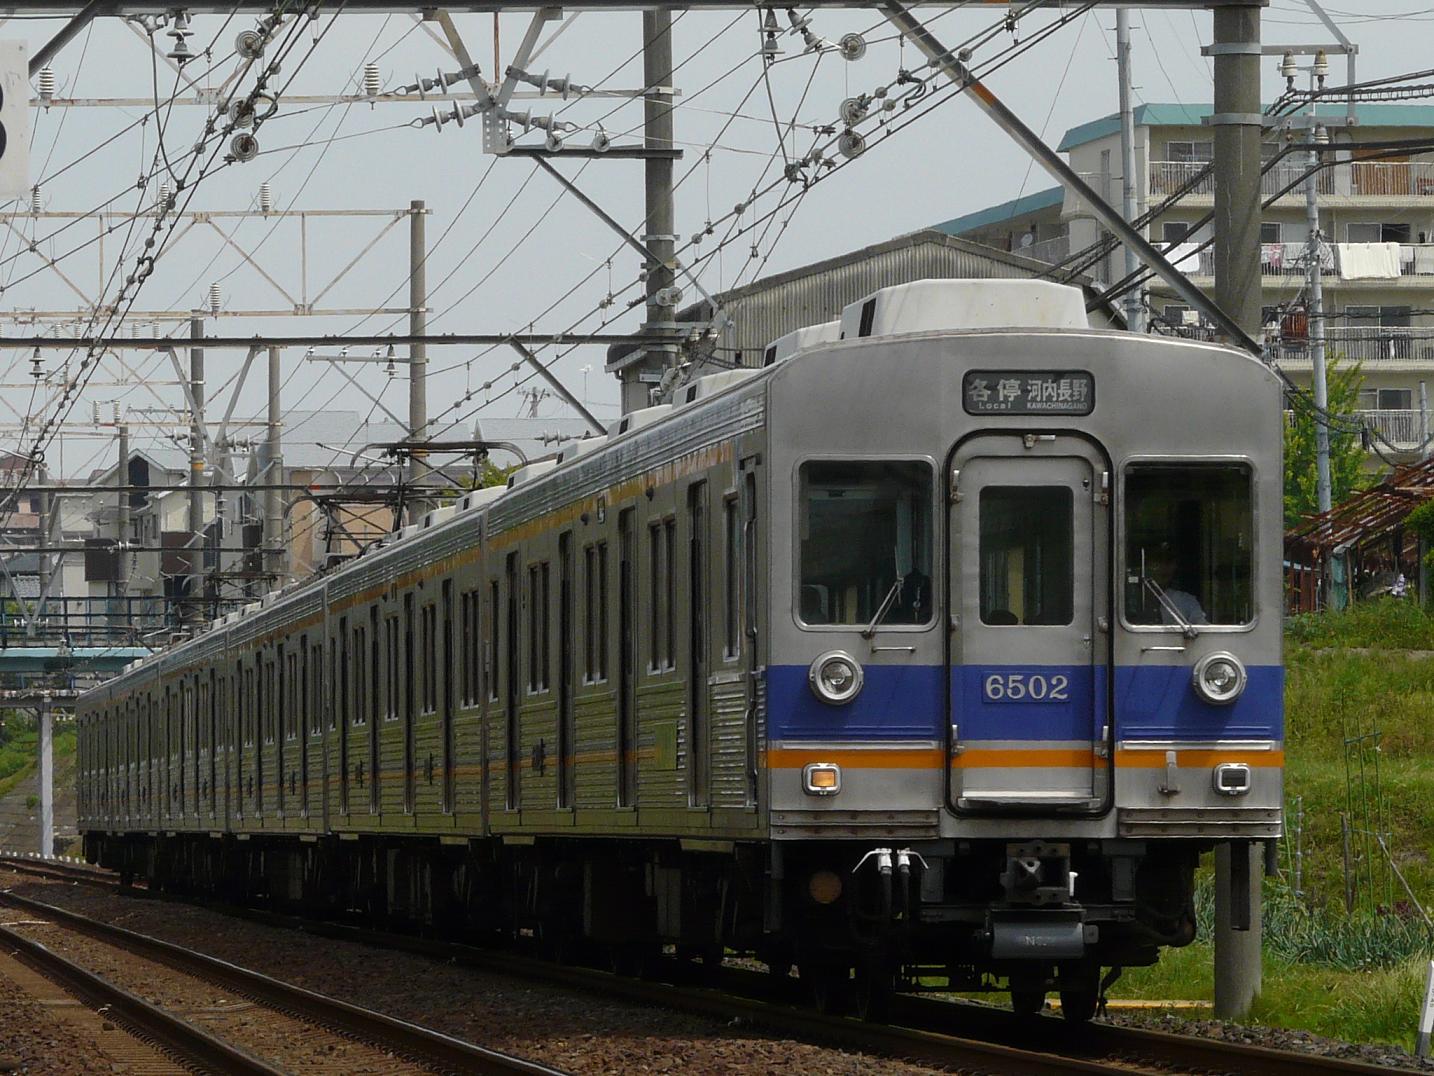 P1190391